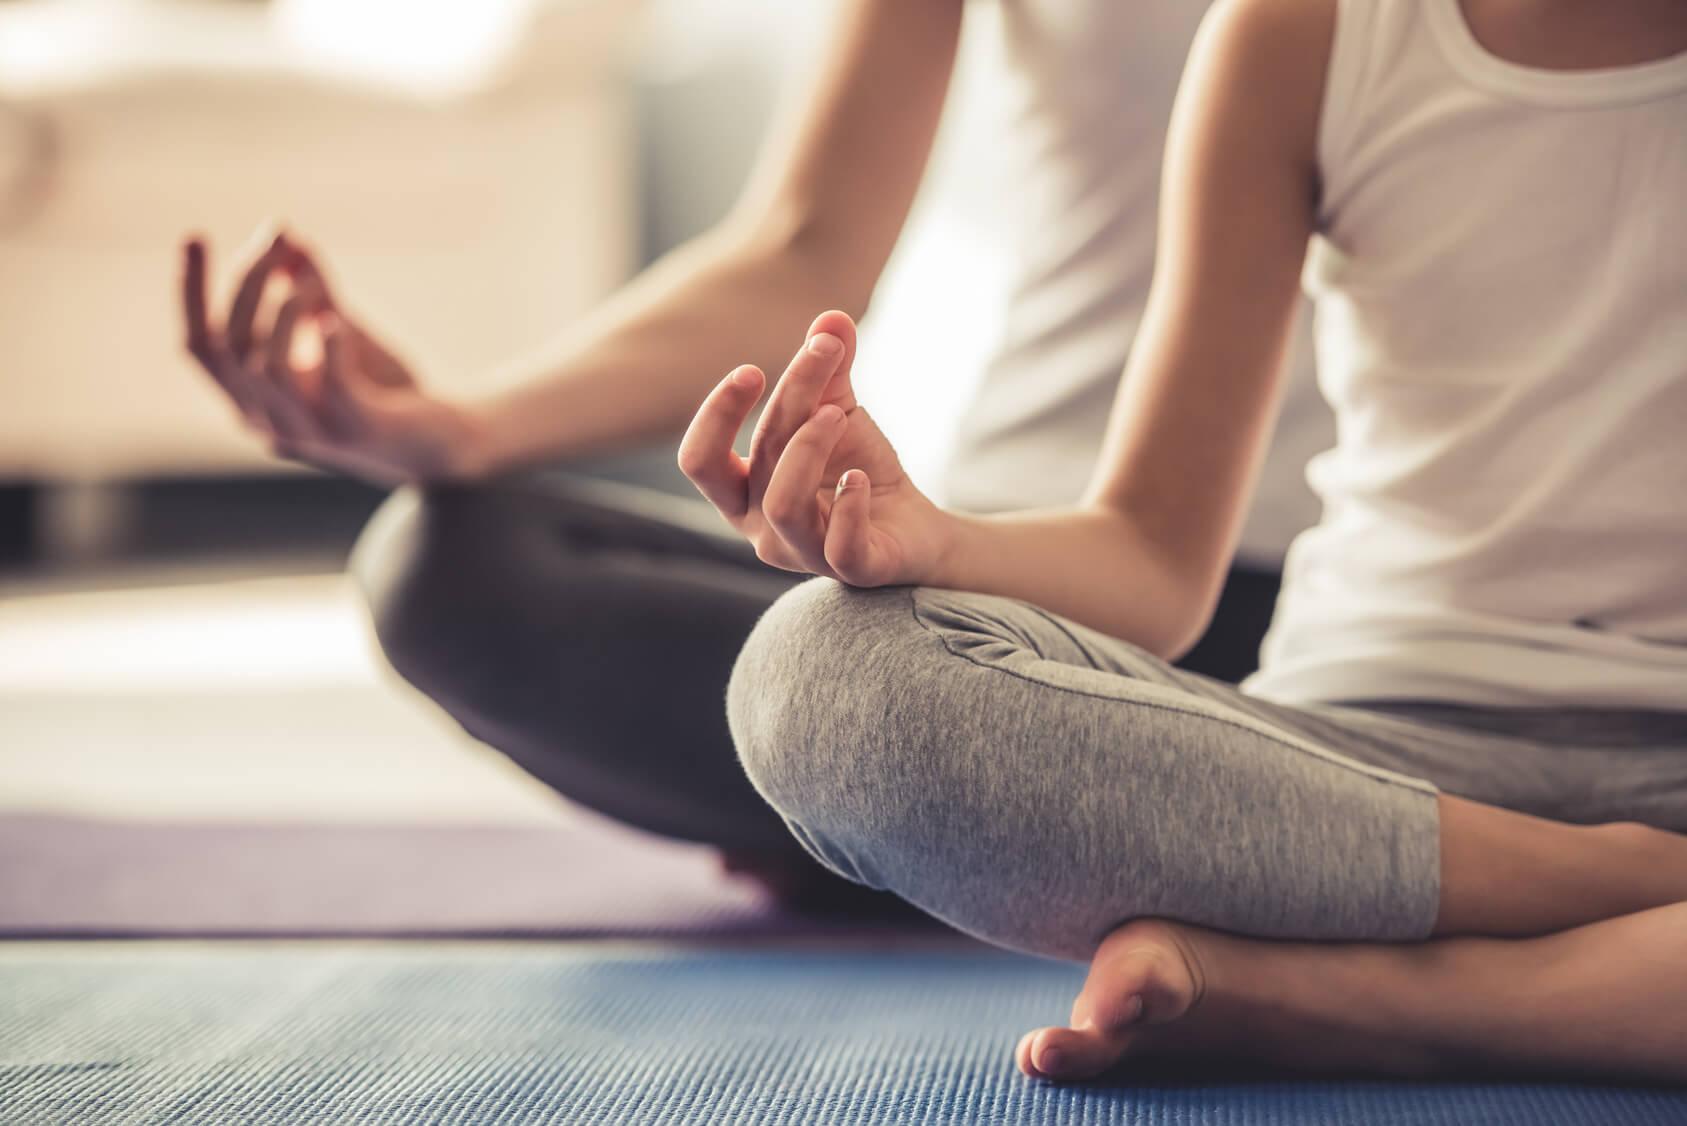 Yoga Kurse Im Therapiezentrum Physiotherapie In Hannover